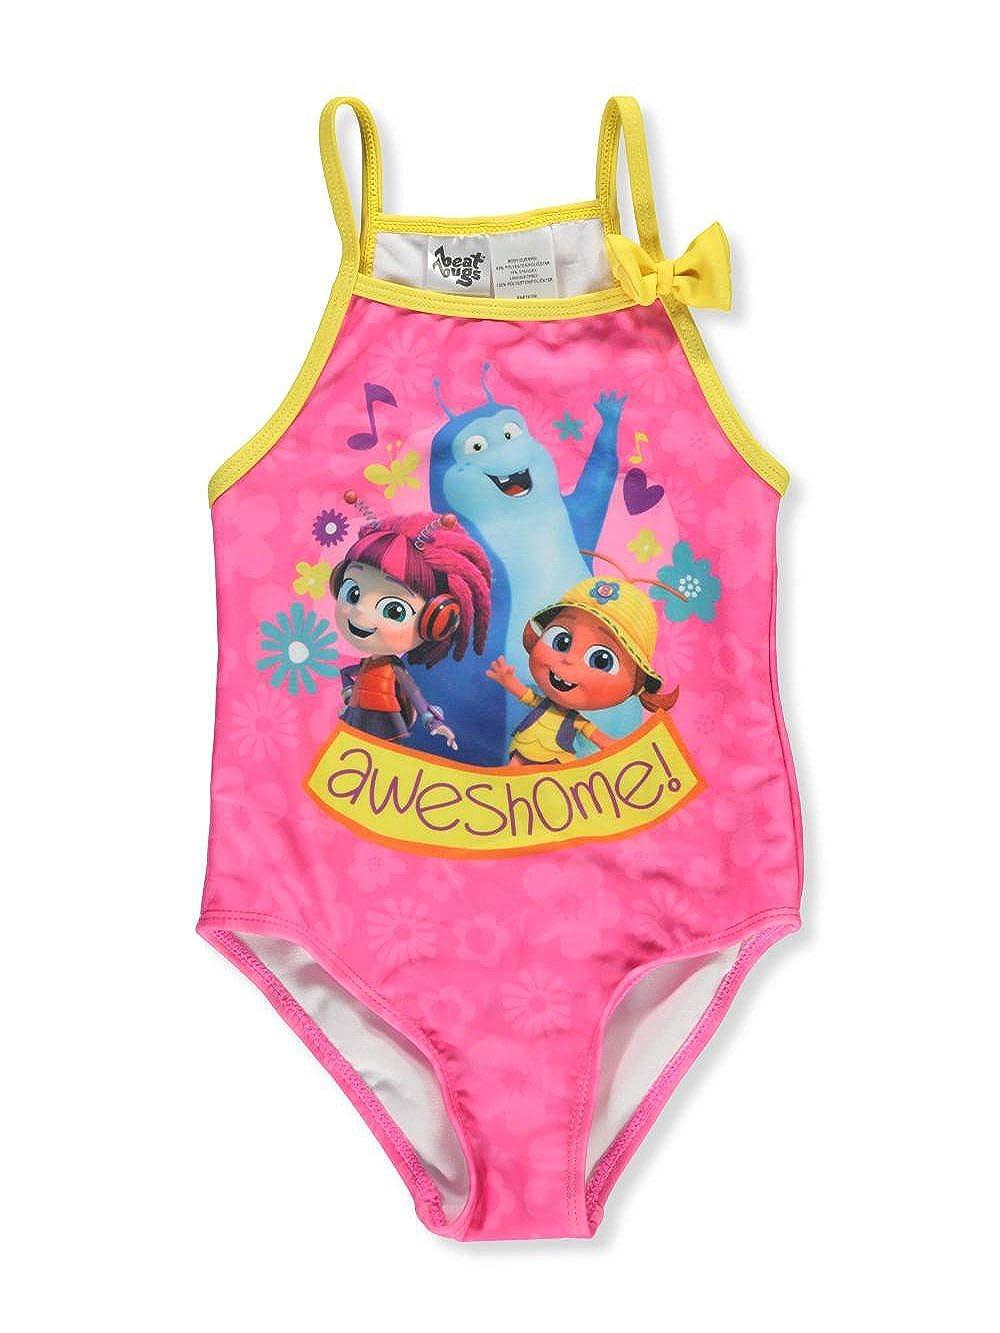 Beat Bugs Girls' 1-Piece Swimsuit